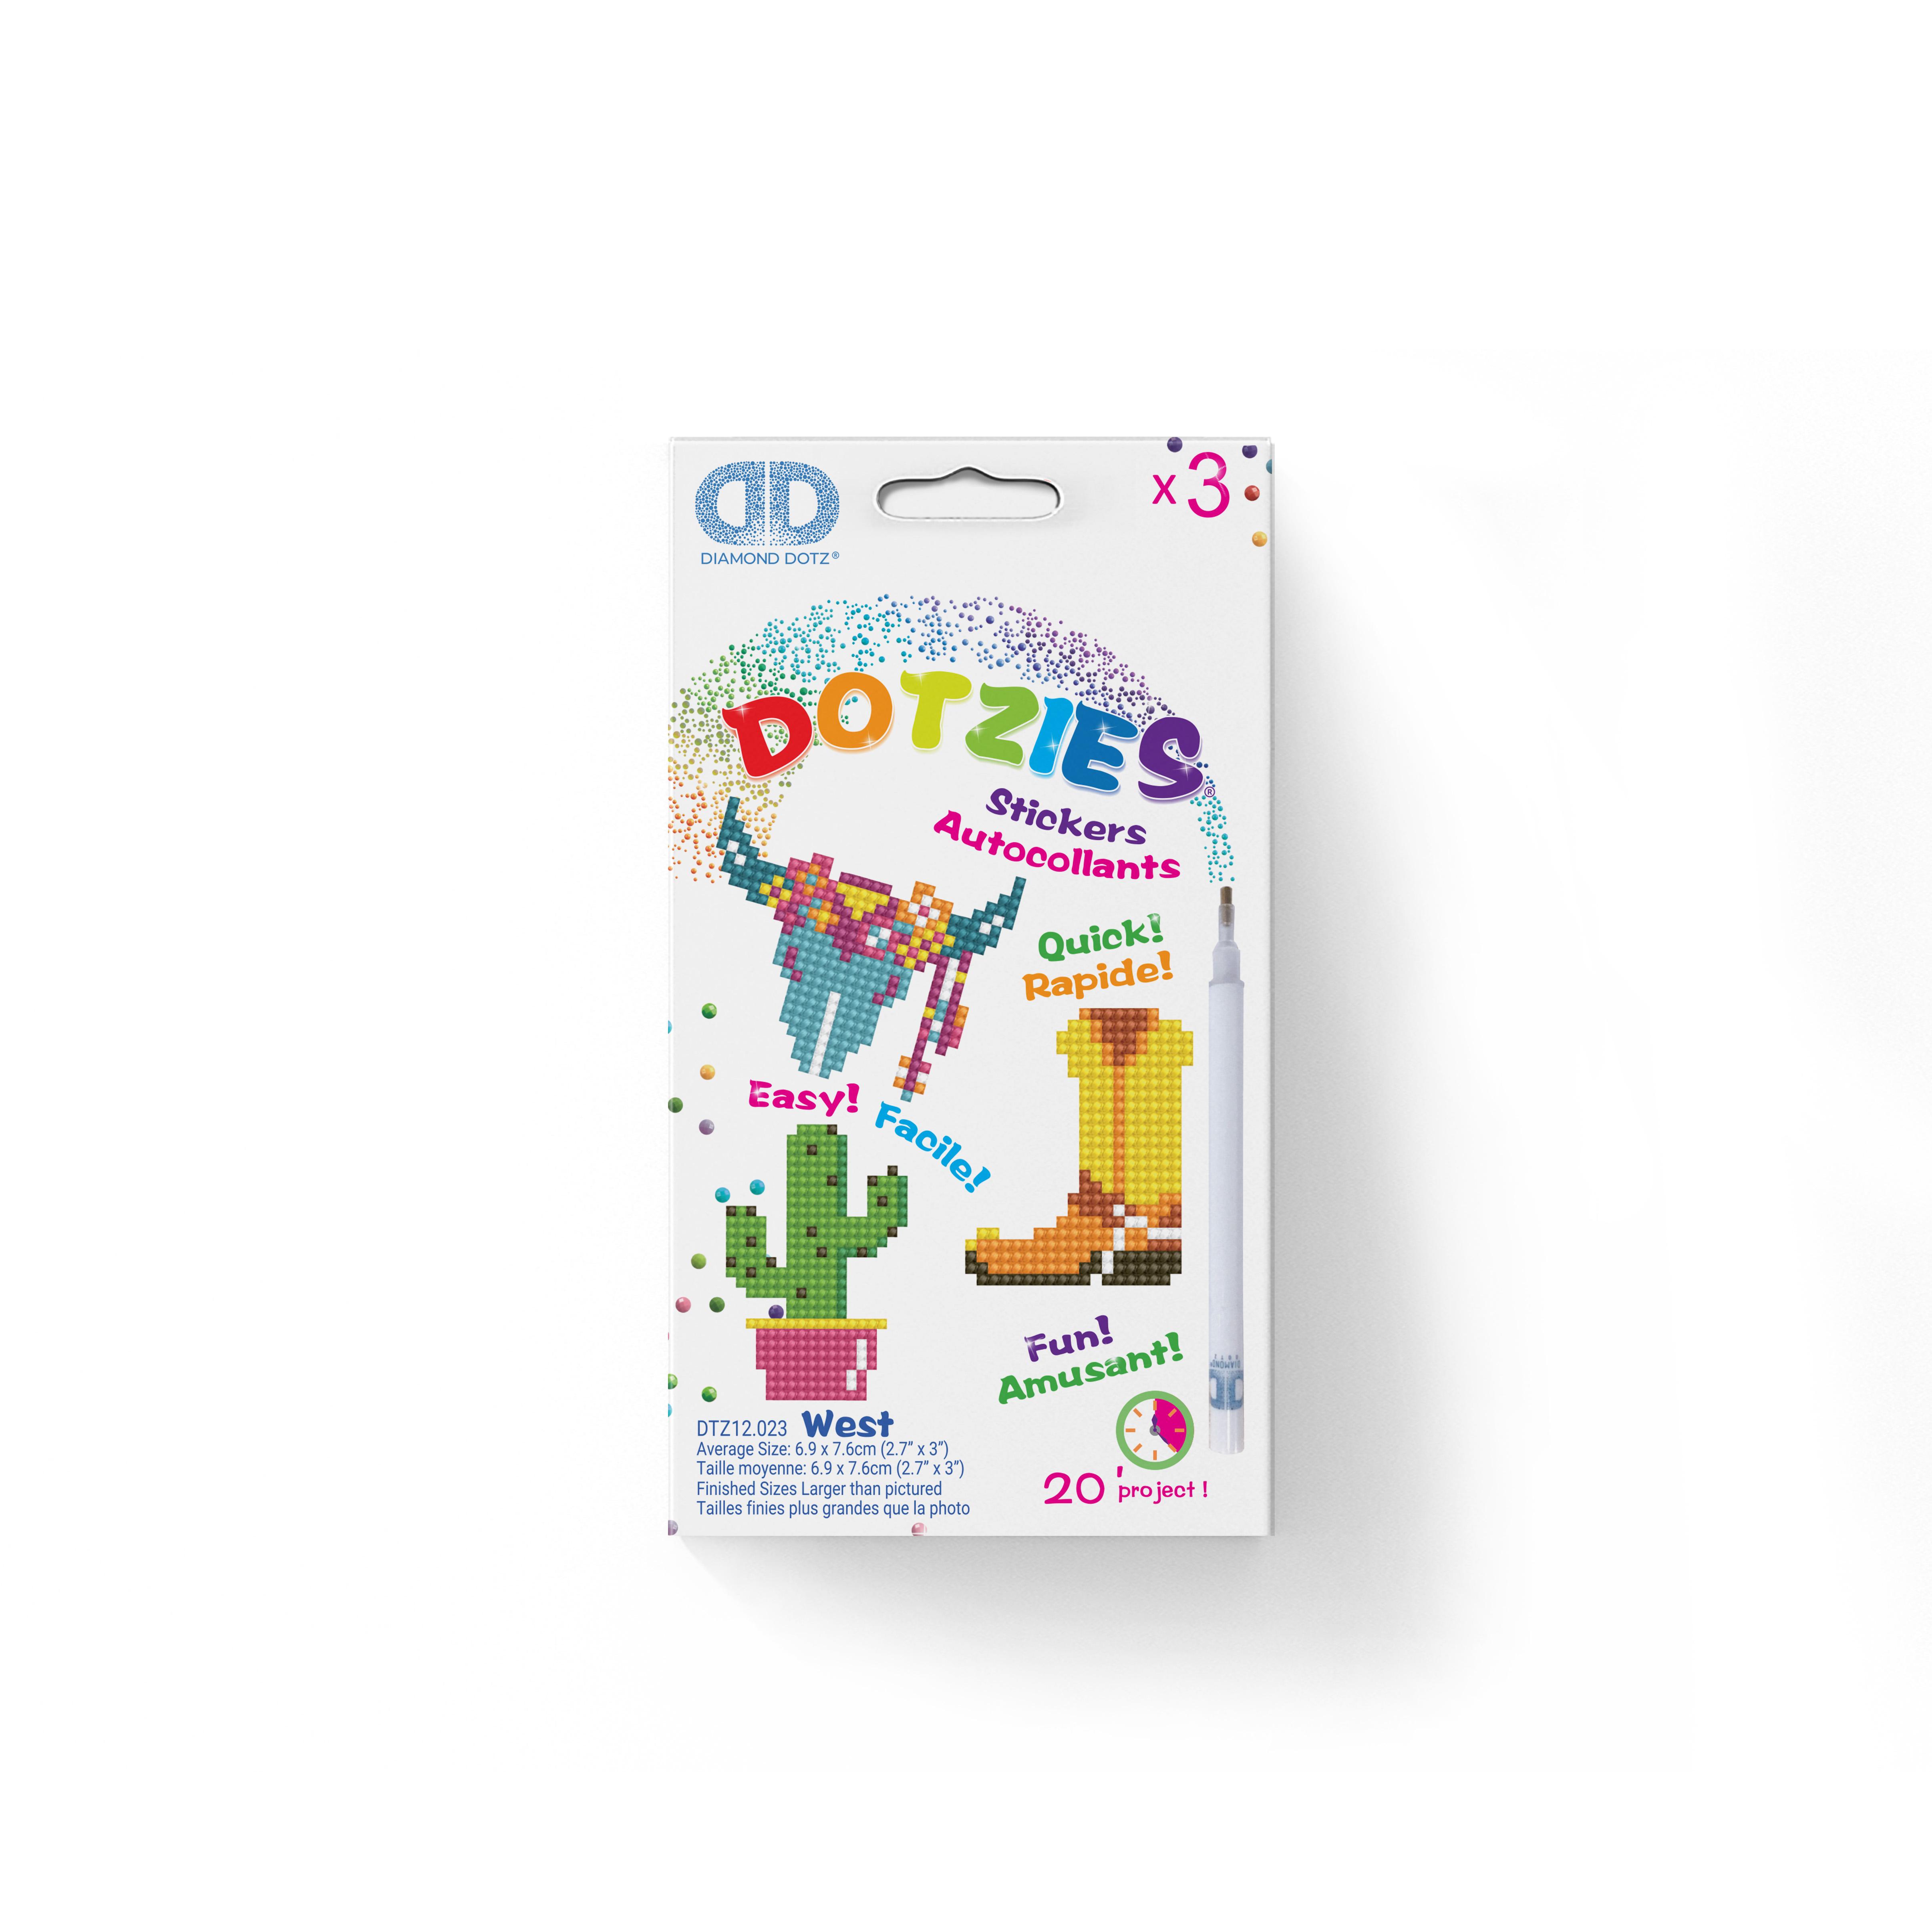 DTZ12.023_packaging